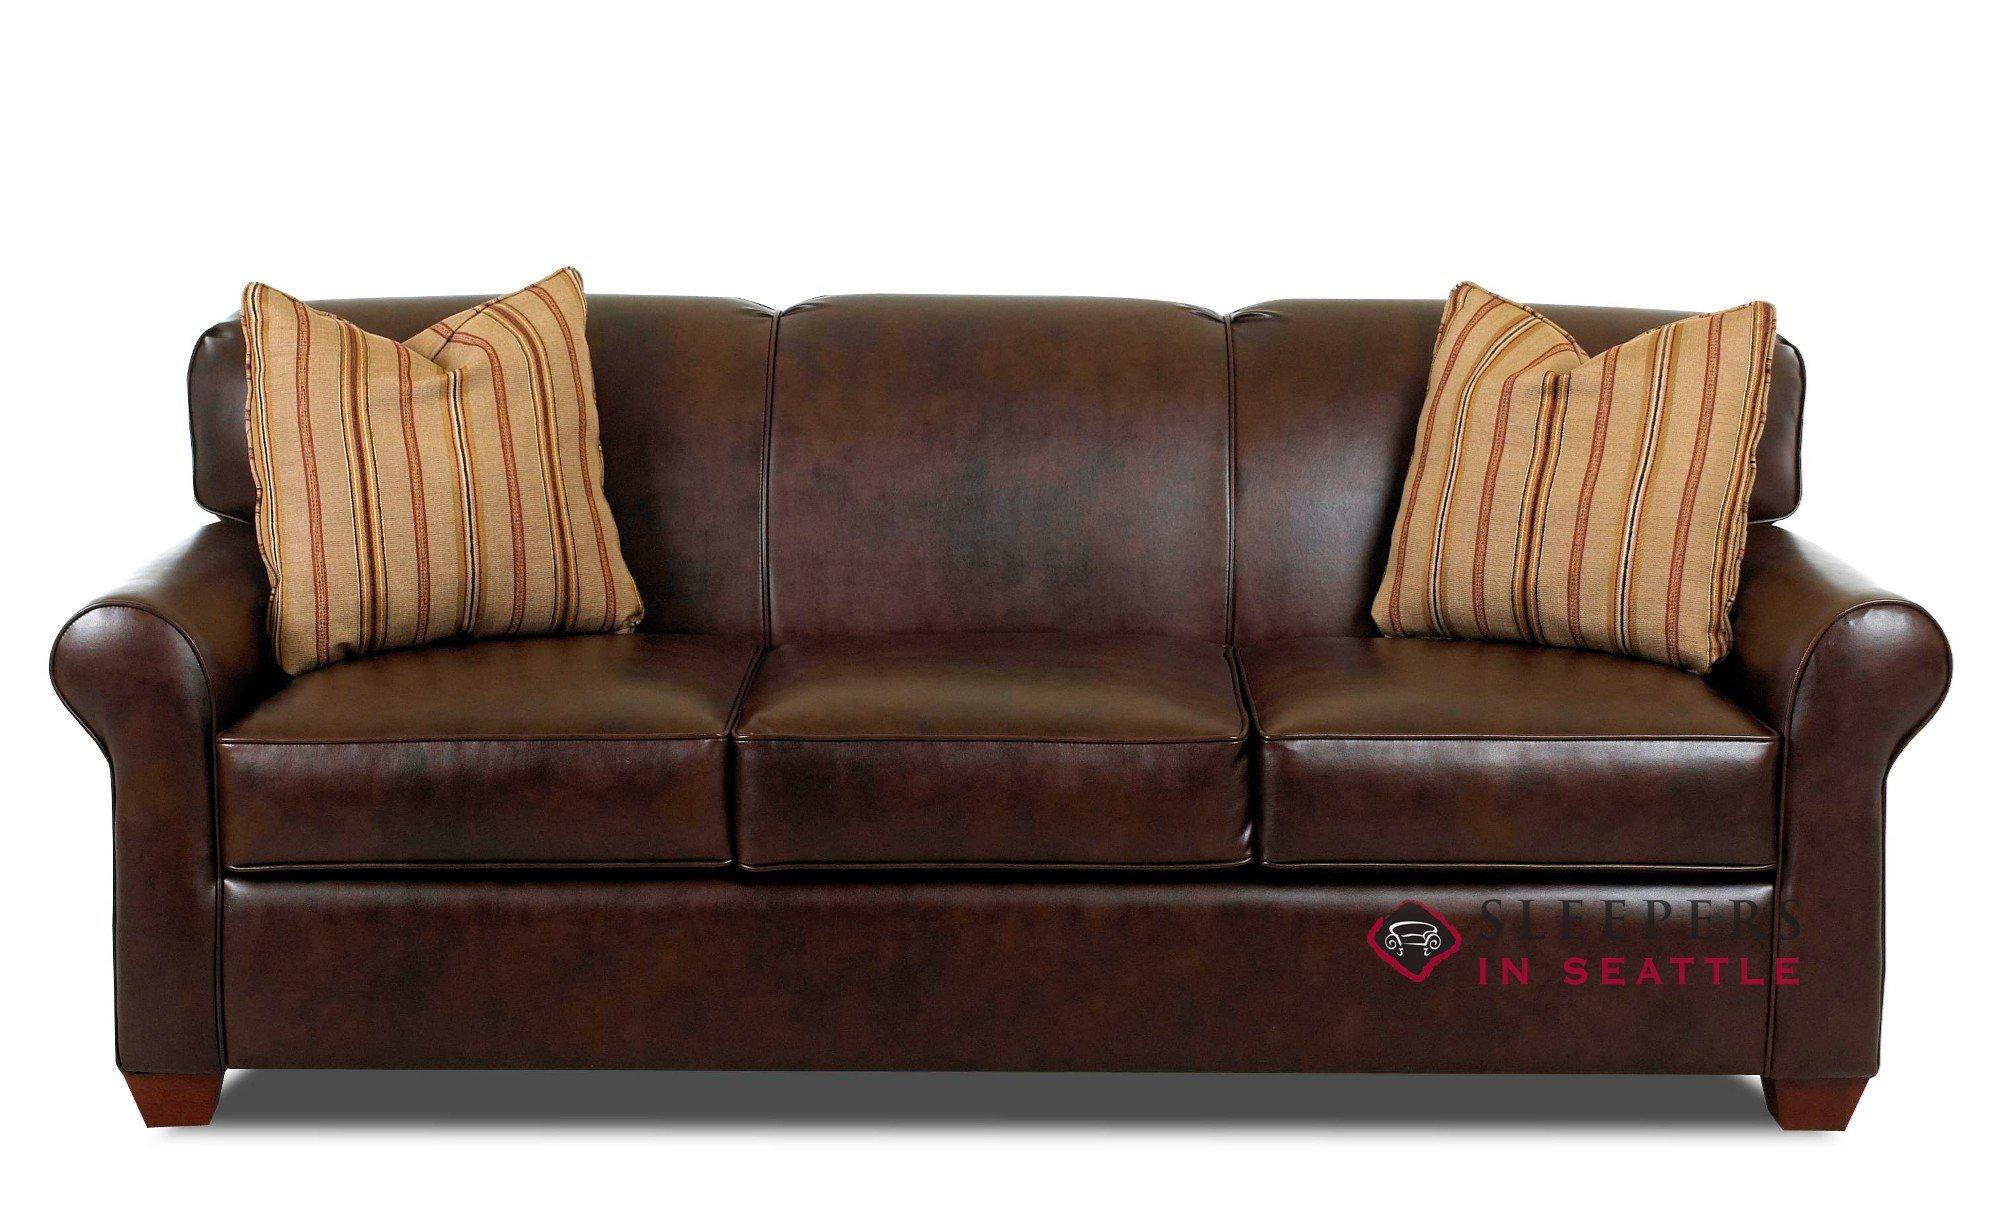 sleep sofa savvy calgary sleeper (queen) in leather BJLQJXS